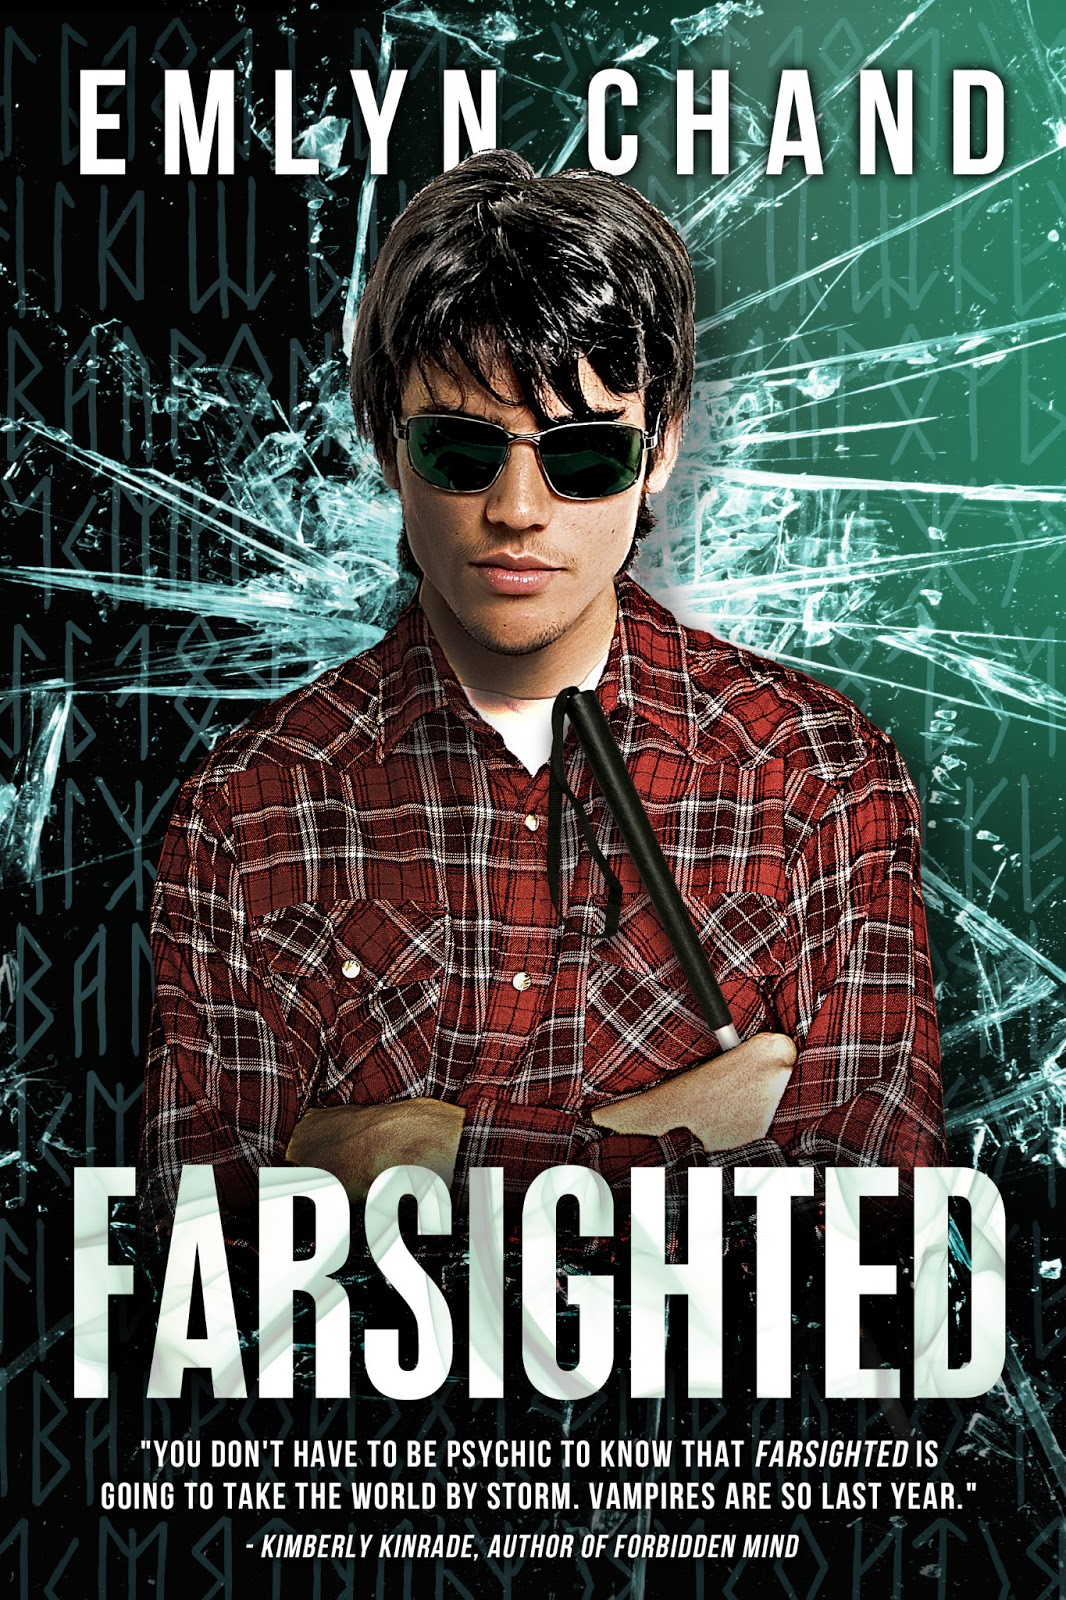 Farsighted & Open Heart by Emlyn Chand Spotlight